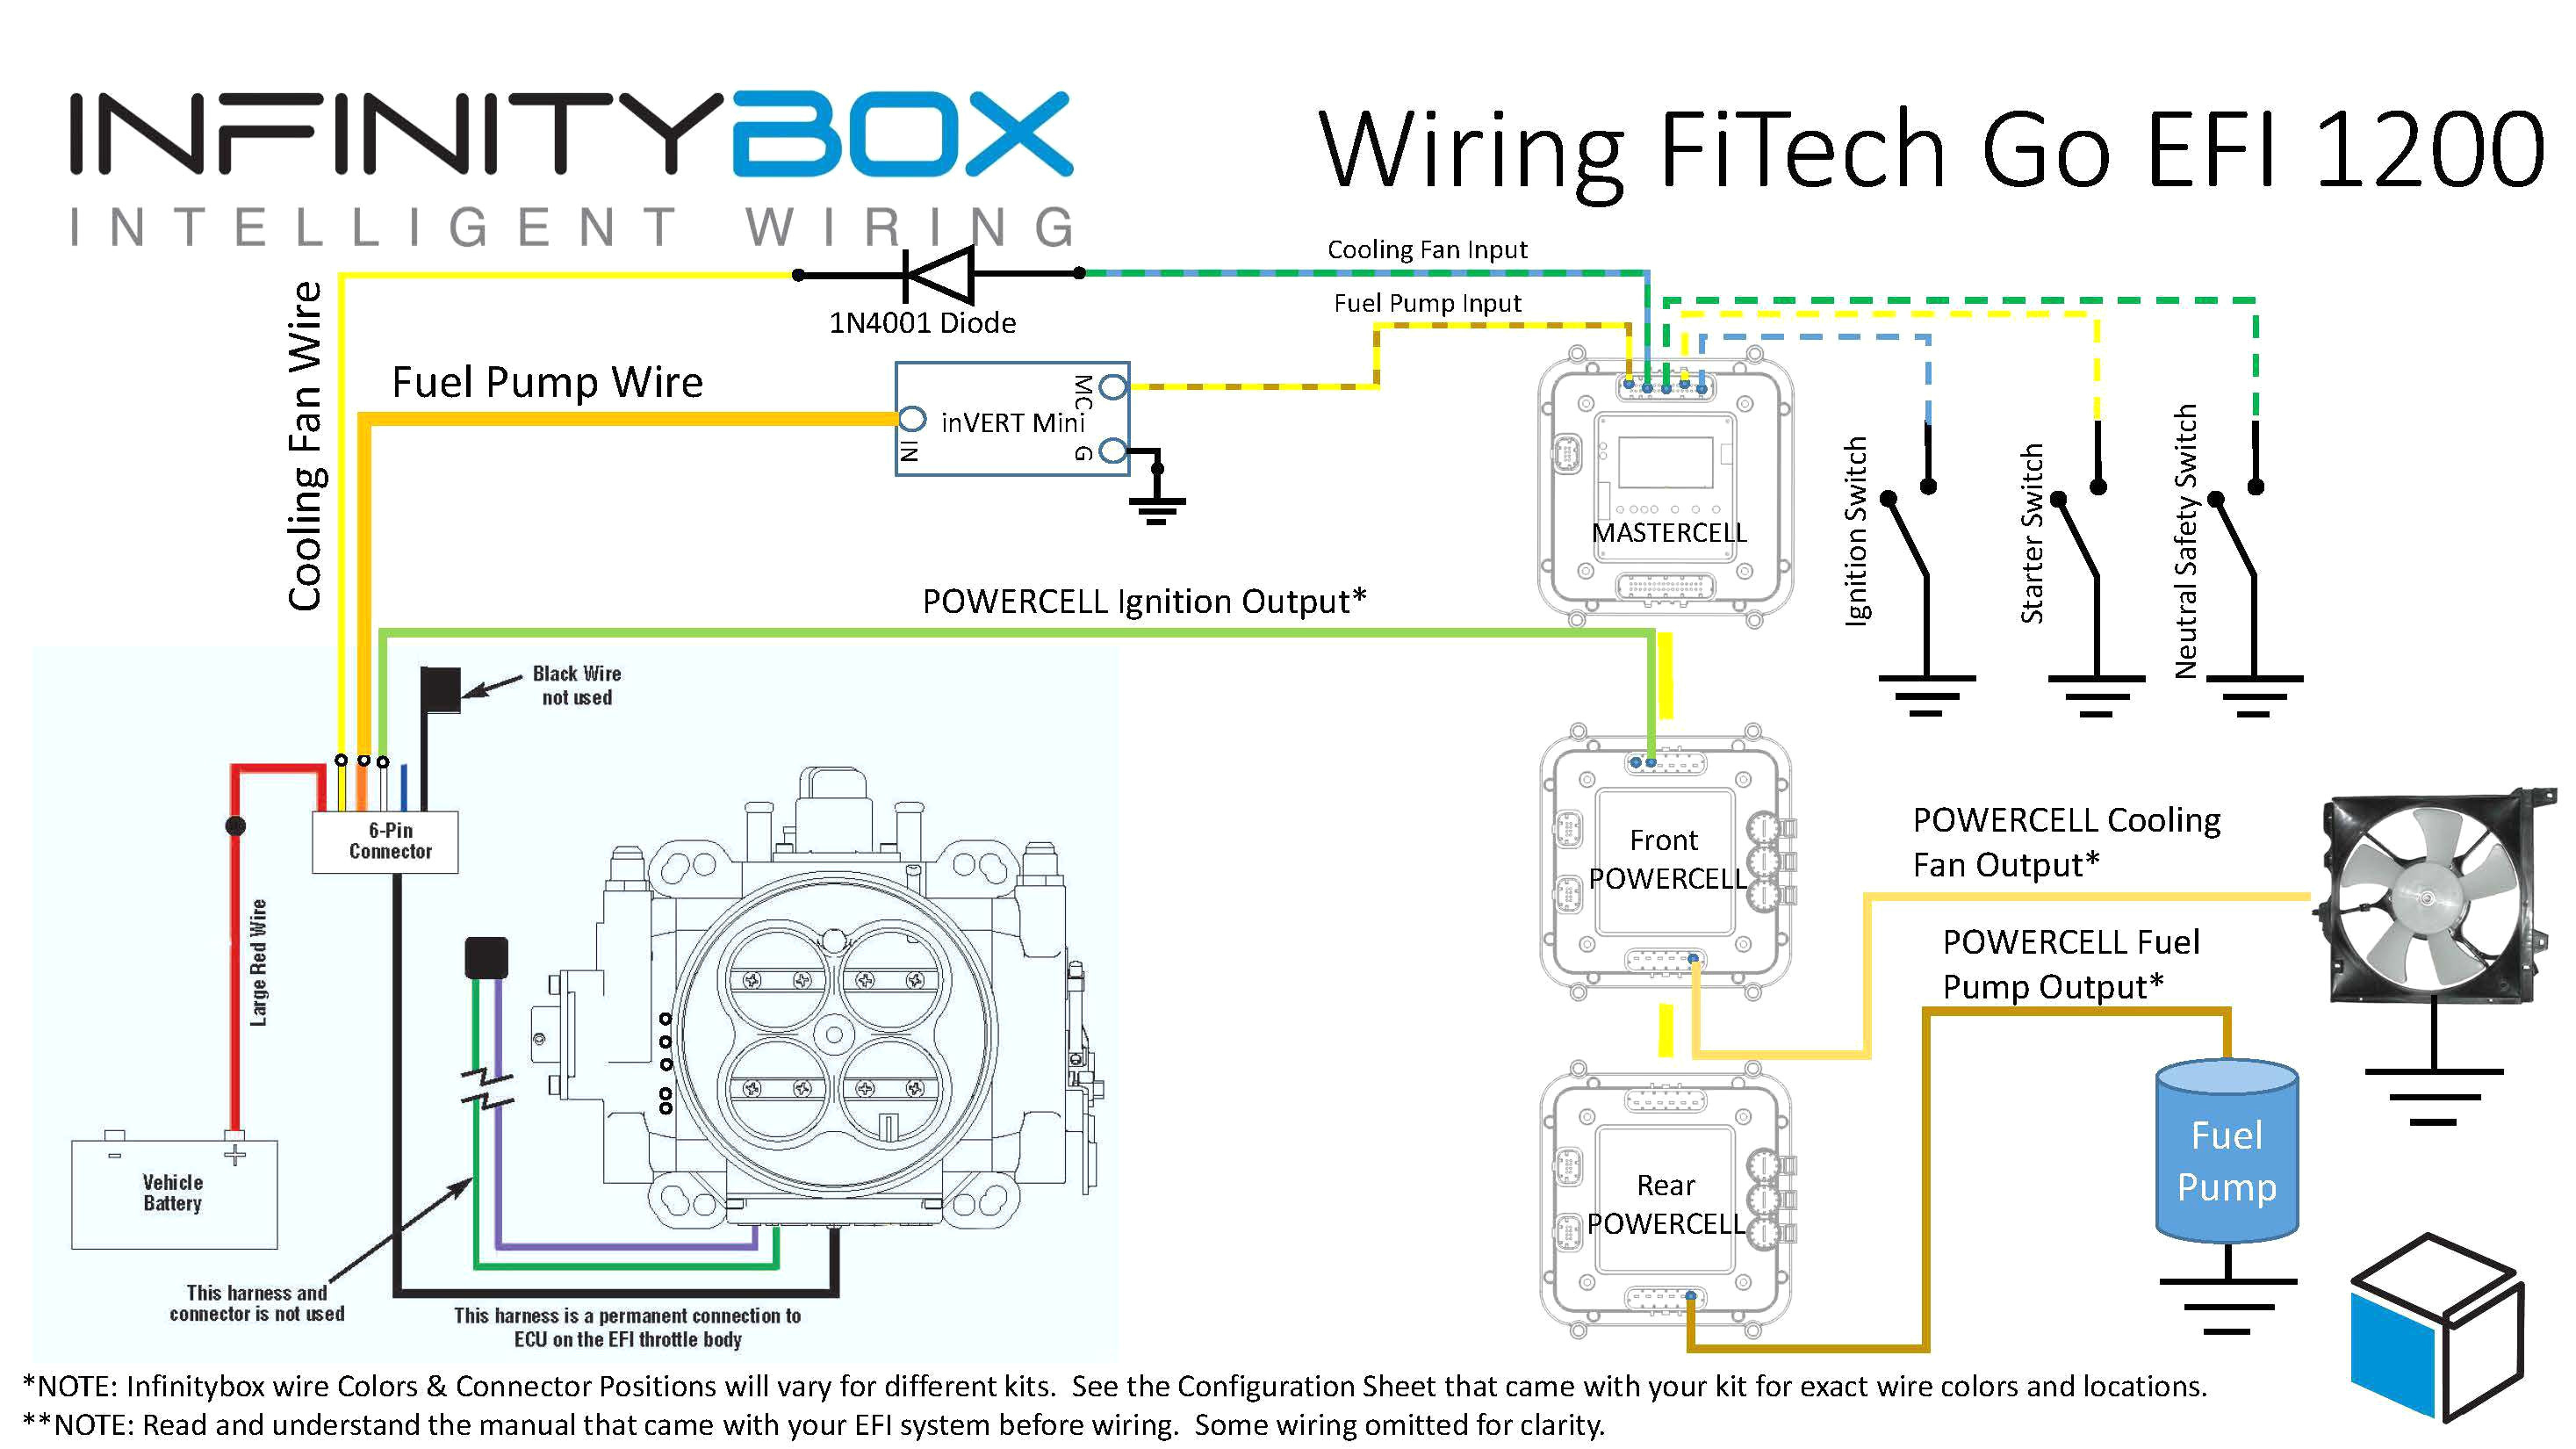 8 Pin Cdi Wiring Diagram | Wiring Library - 5 Pin Cdi Box Wiring Diagram